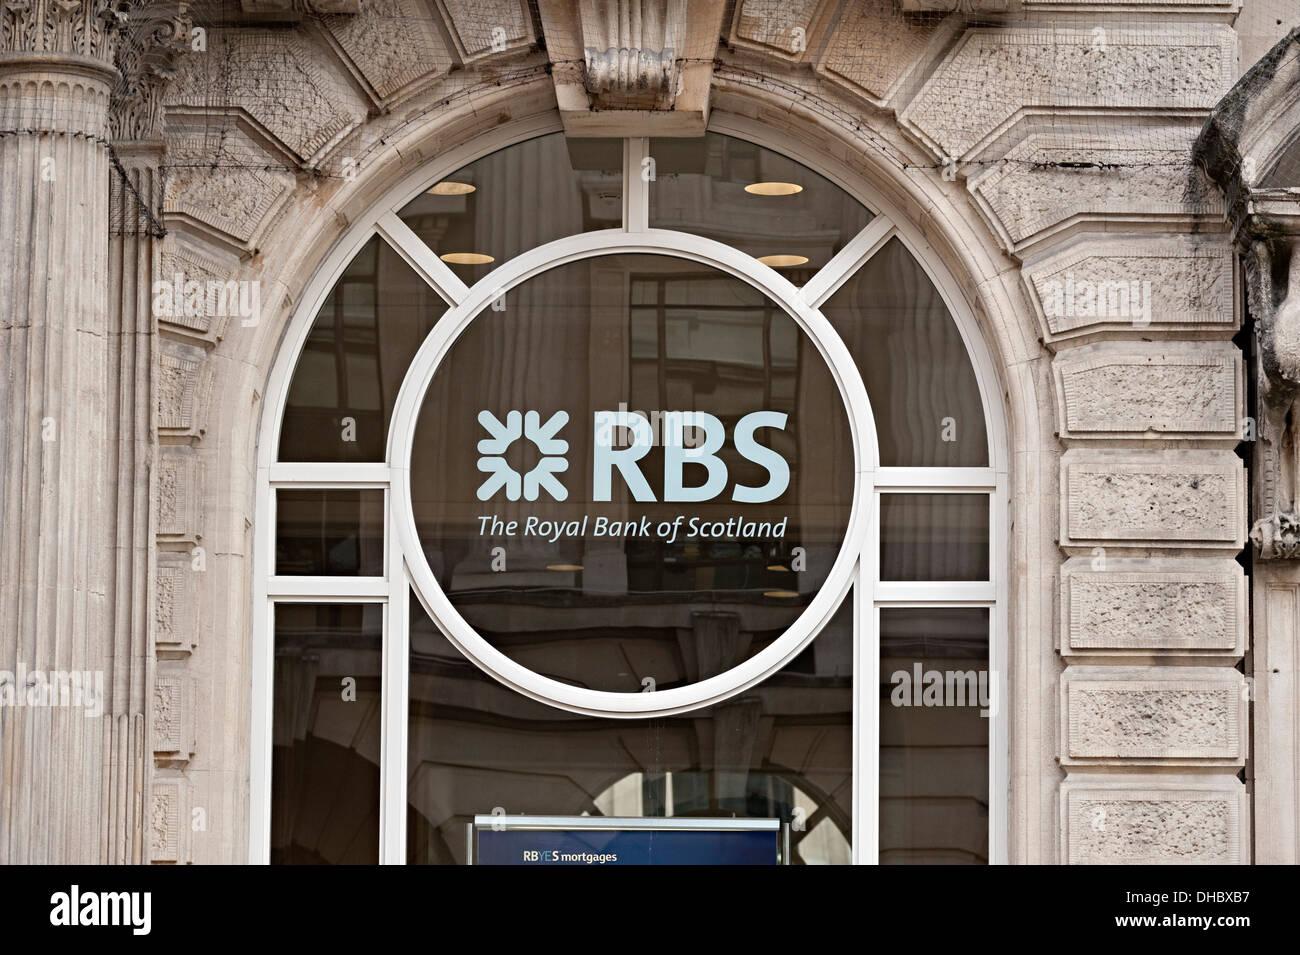 Rbs royal bank scotland birmingham stock photo 62342427 alamy rbs royal bank scotland birmingham malvernweather Images